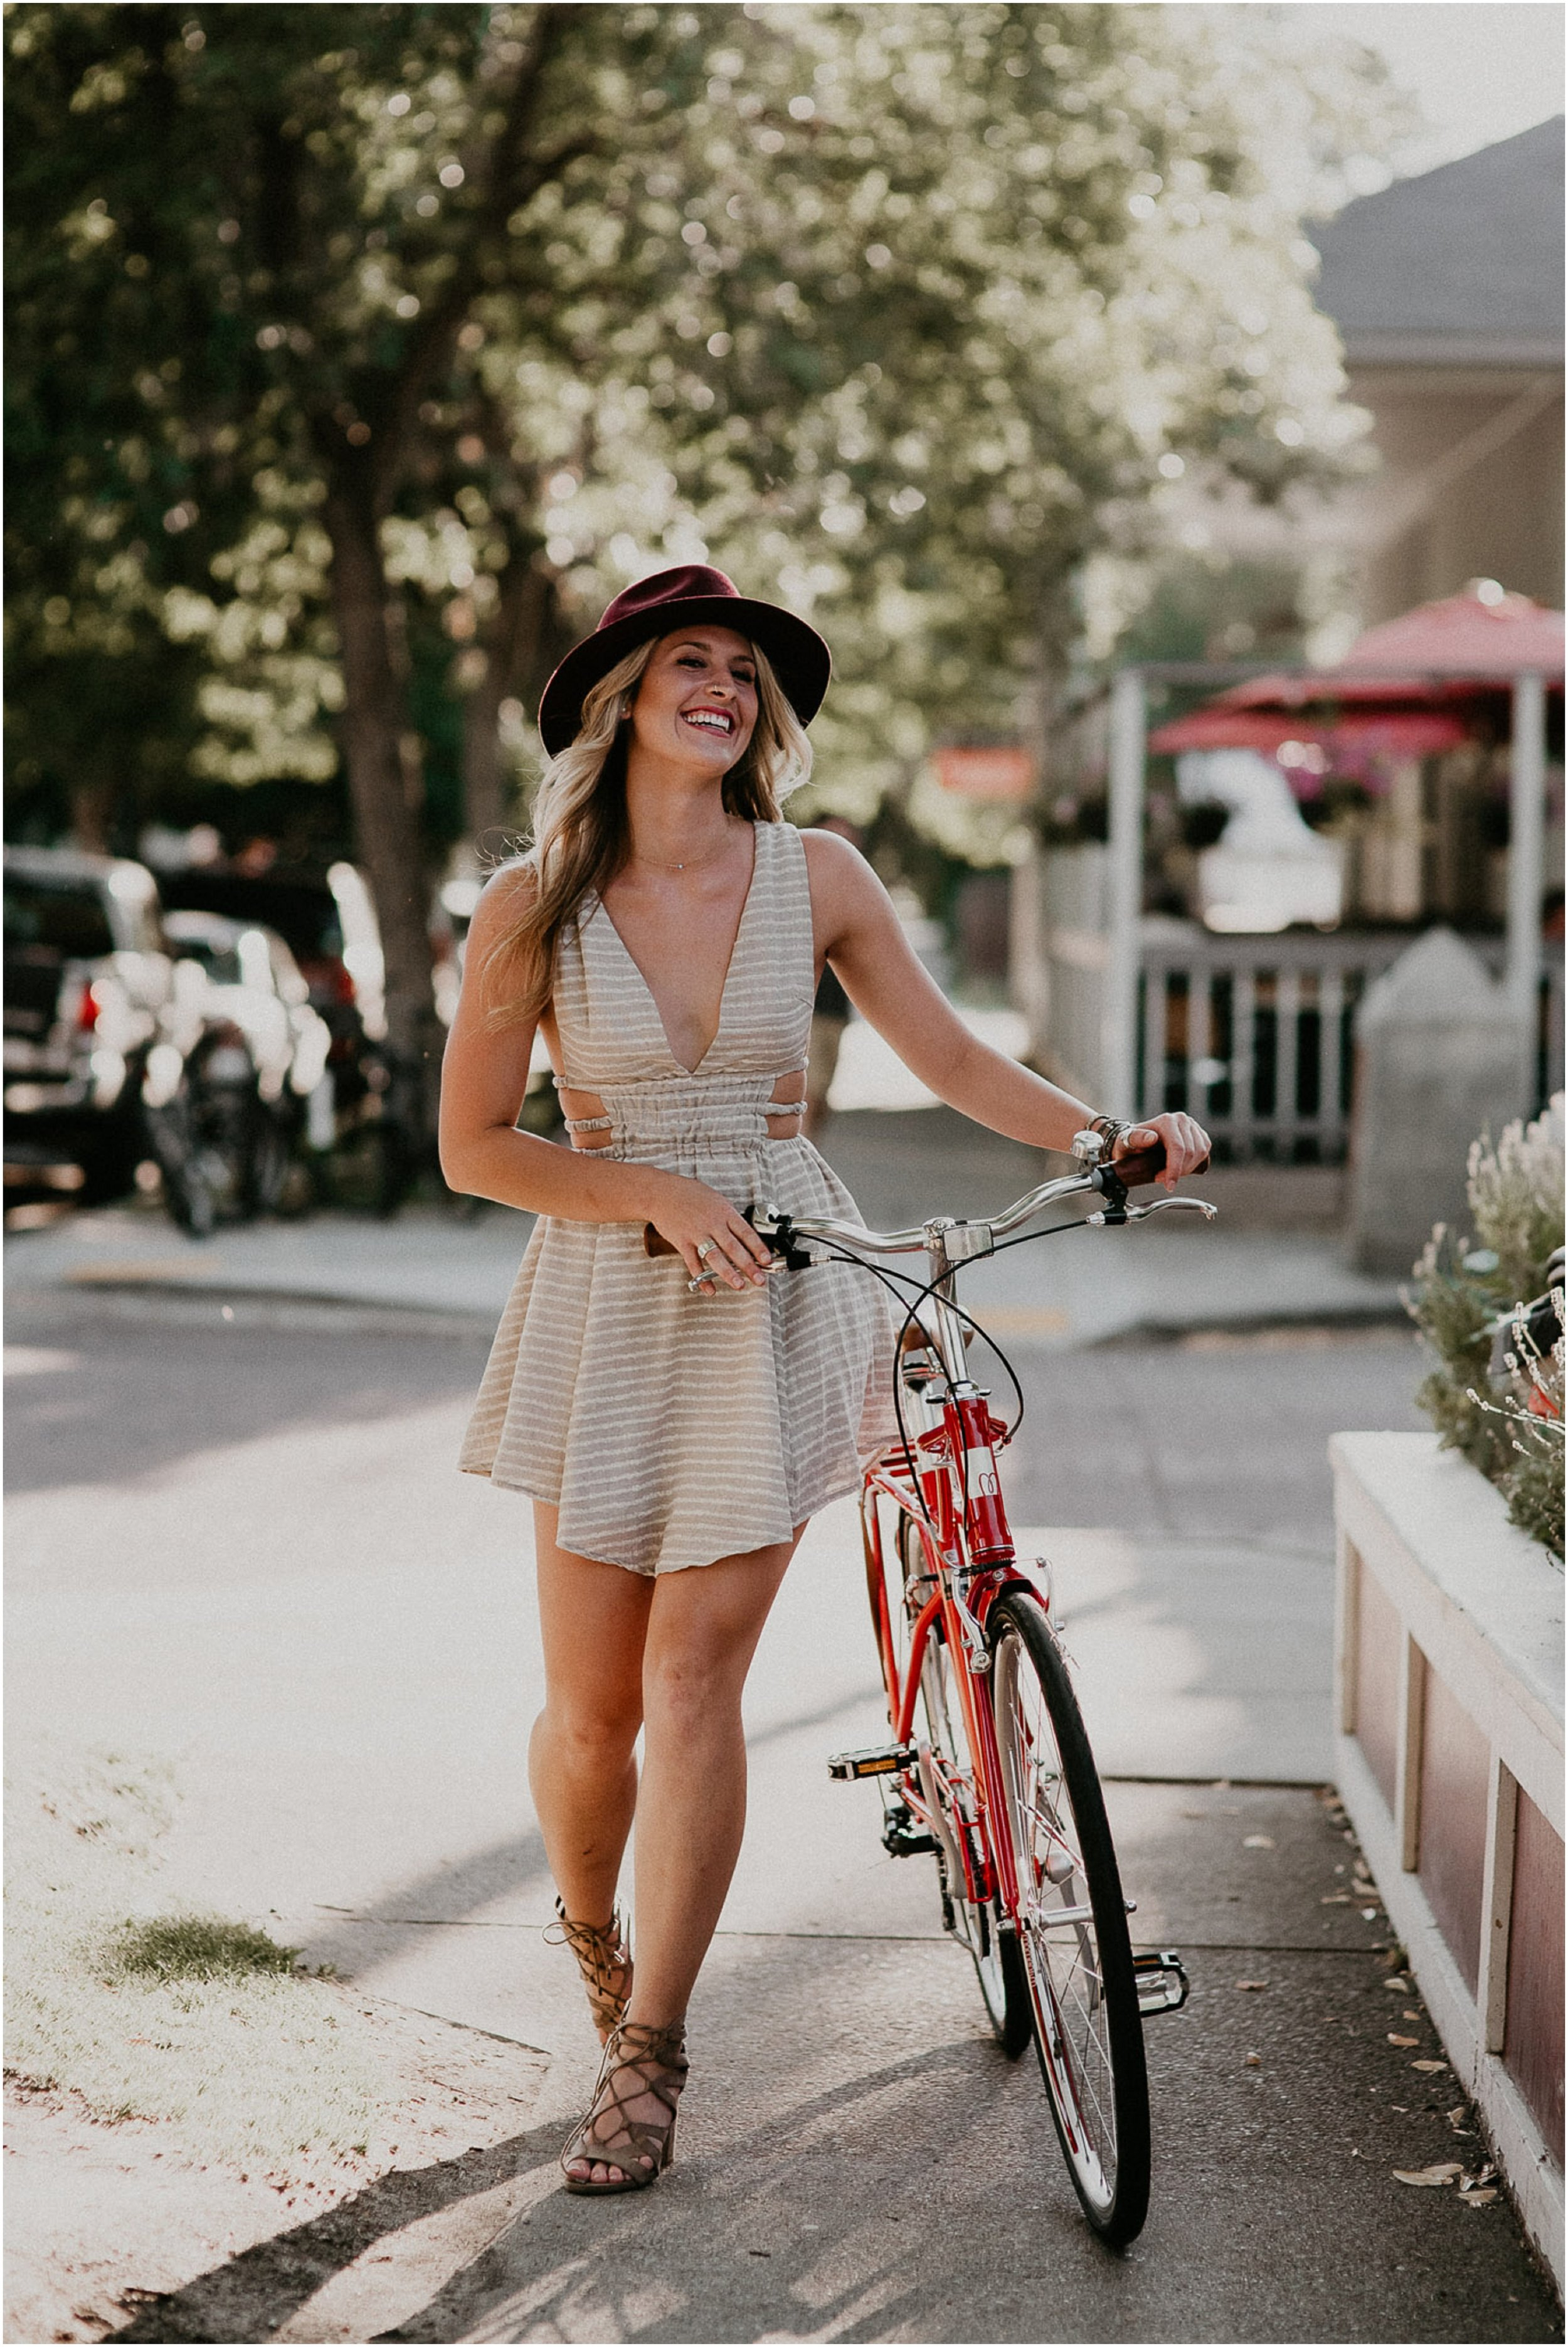 Boise Senior Photographer Makayla Madden Photography Downtown Boise Bike Laughter Styling Boho Idaho Hyde Park Dress Senior Outfit Ideas Swank Boutique